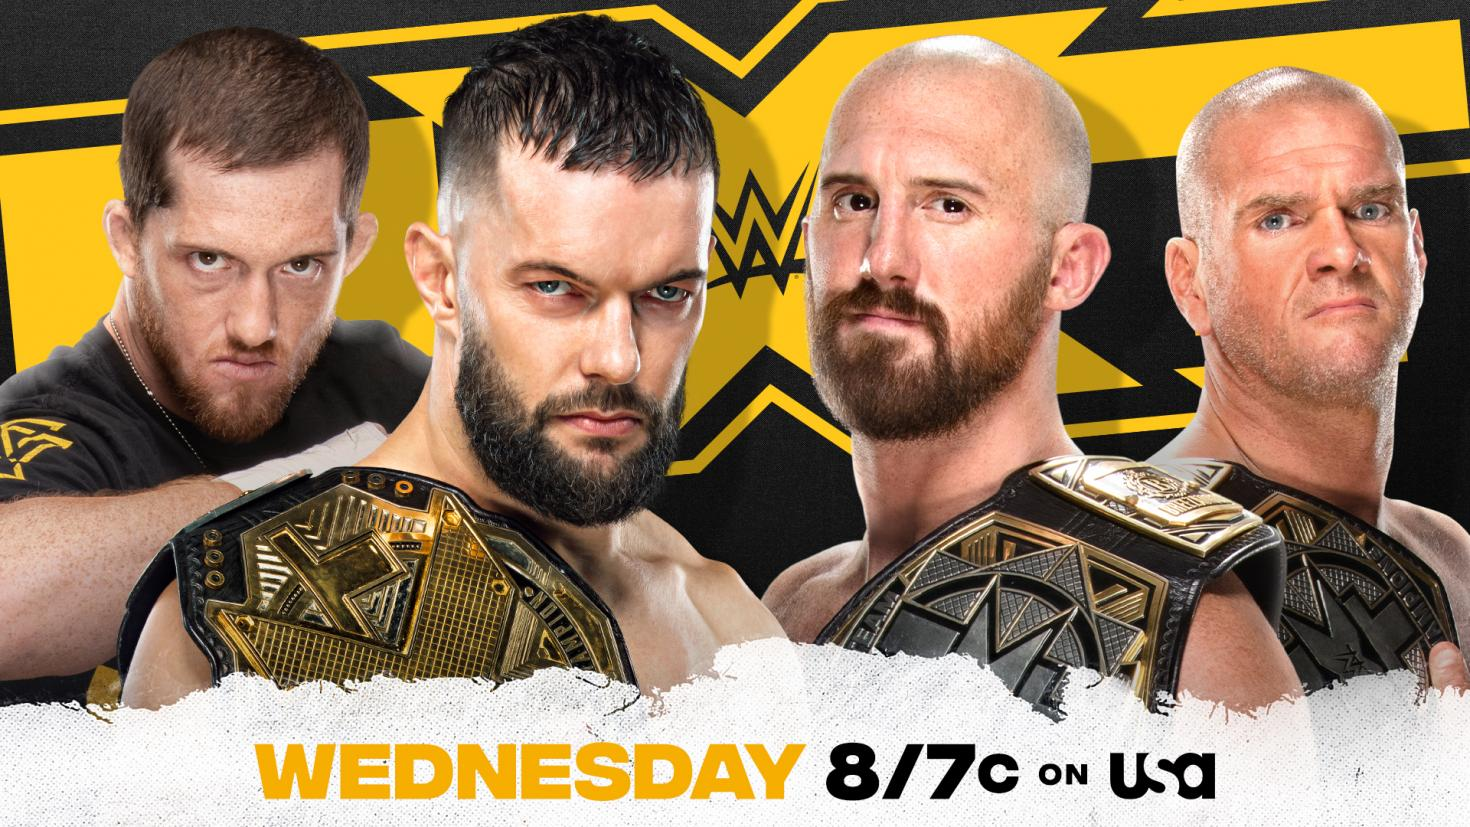 NXT Results – Jan. 27, 2021 – Balor & O'Reilly vs. Lorcan & Burch – TPWW